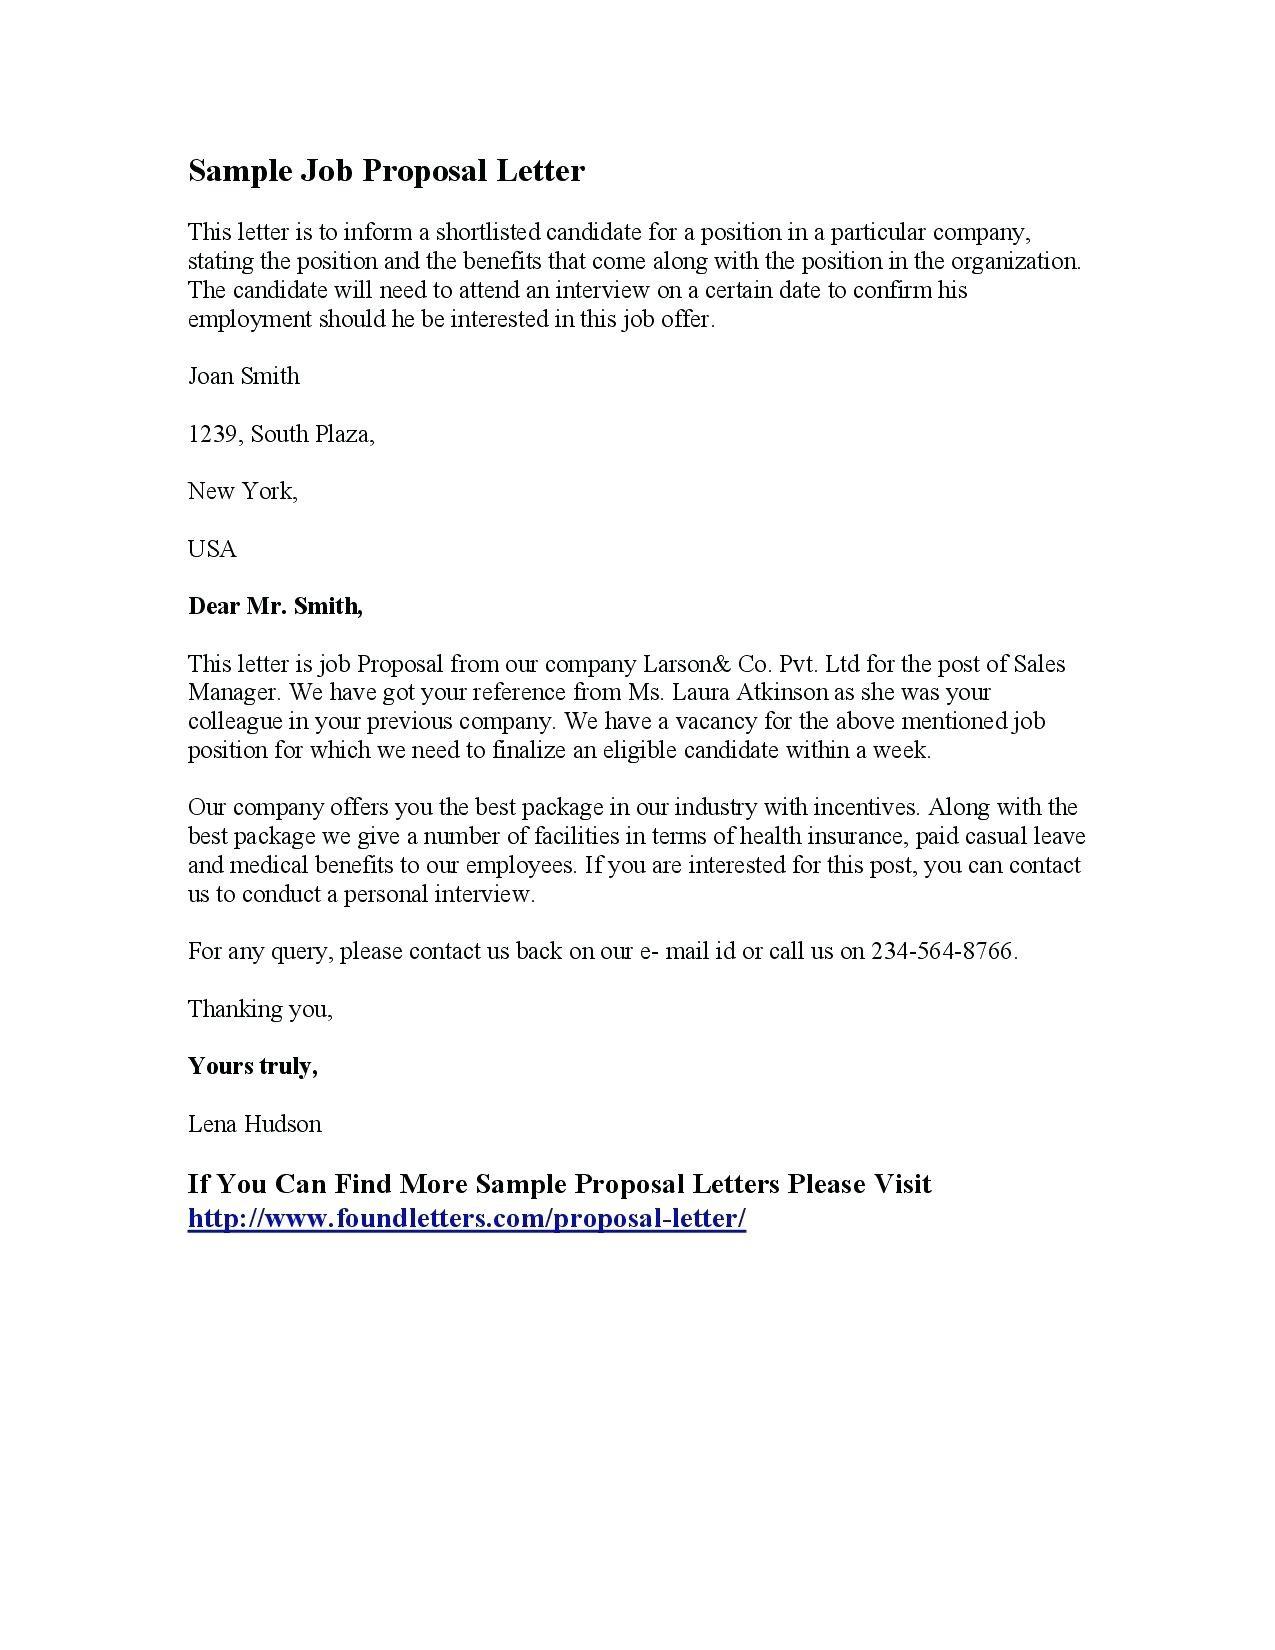 Employment counter offer letter template samples letter template employment counter offer letter template altavistaventures Gallery